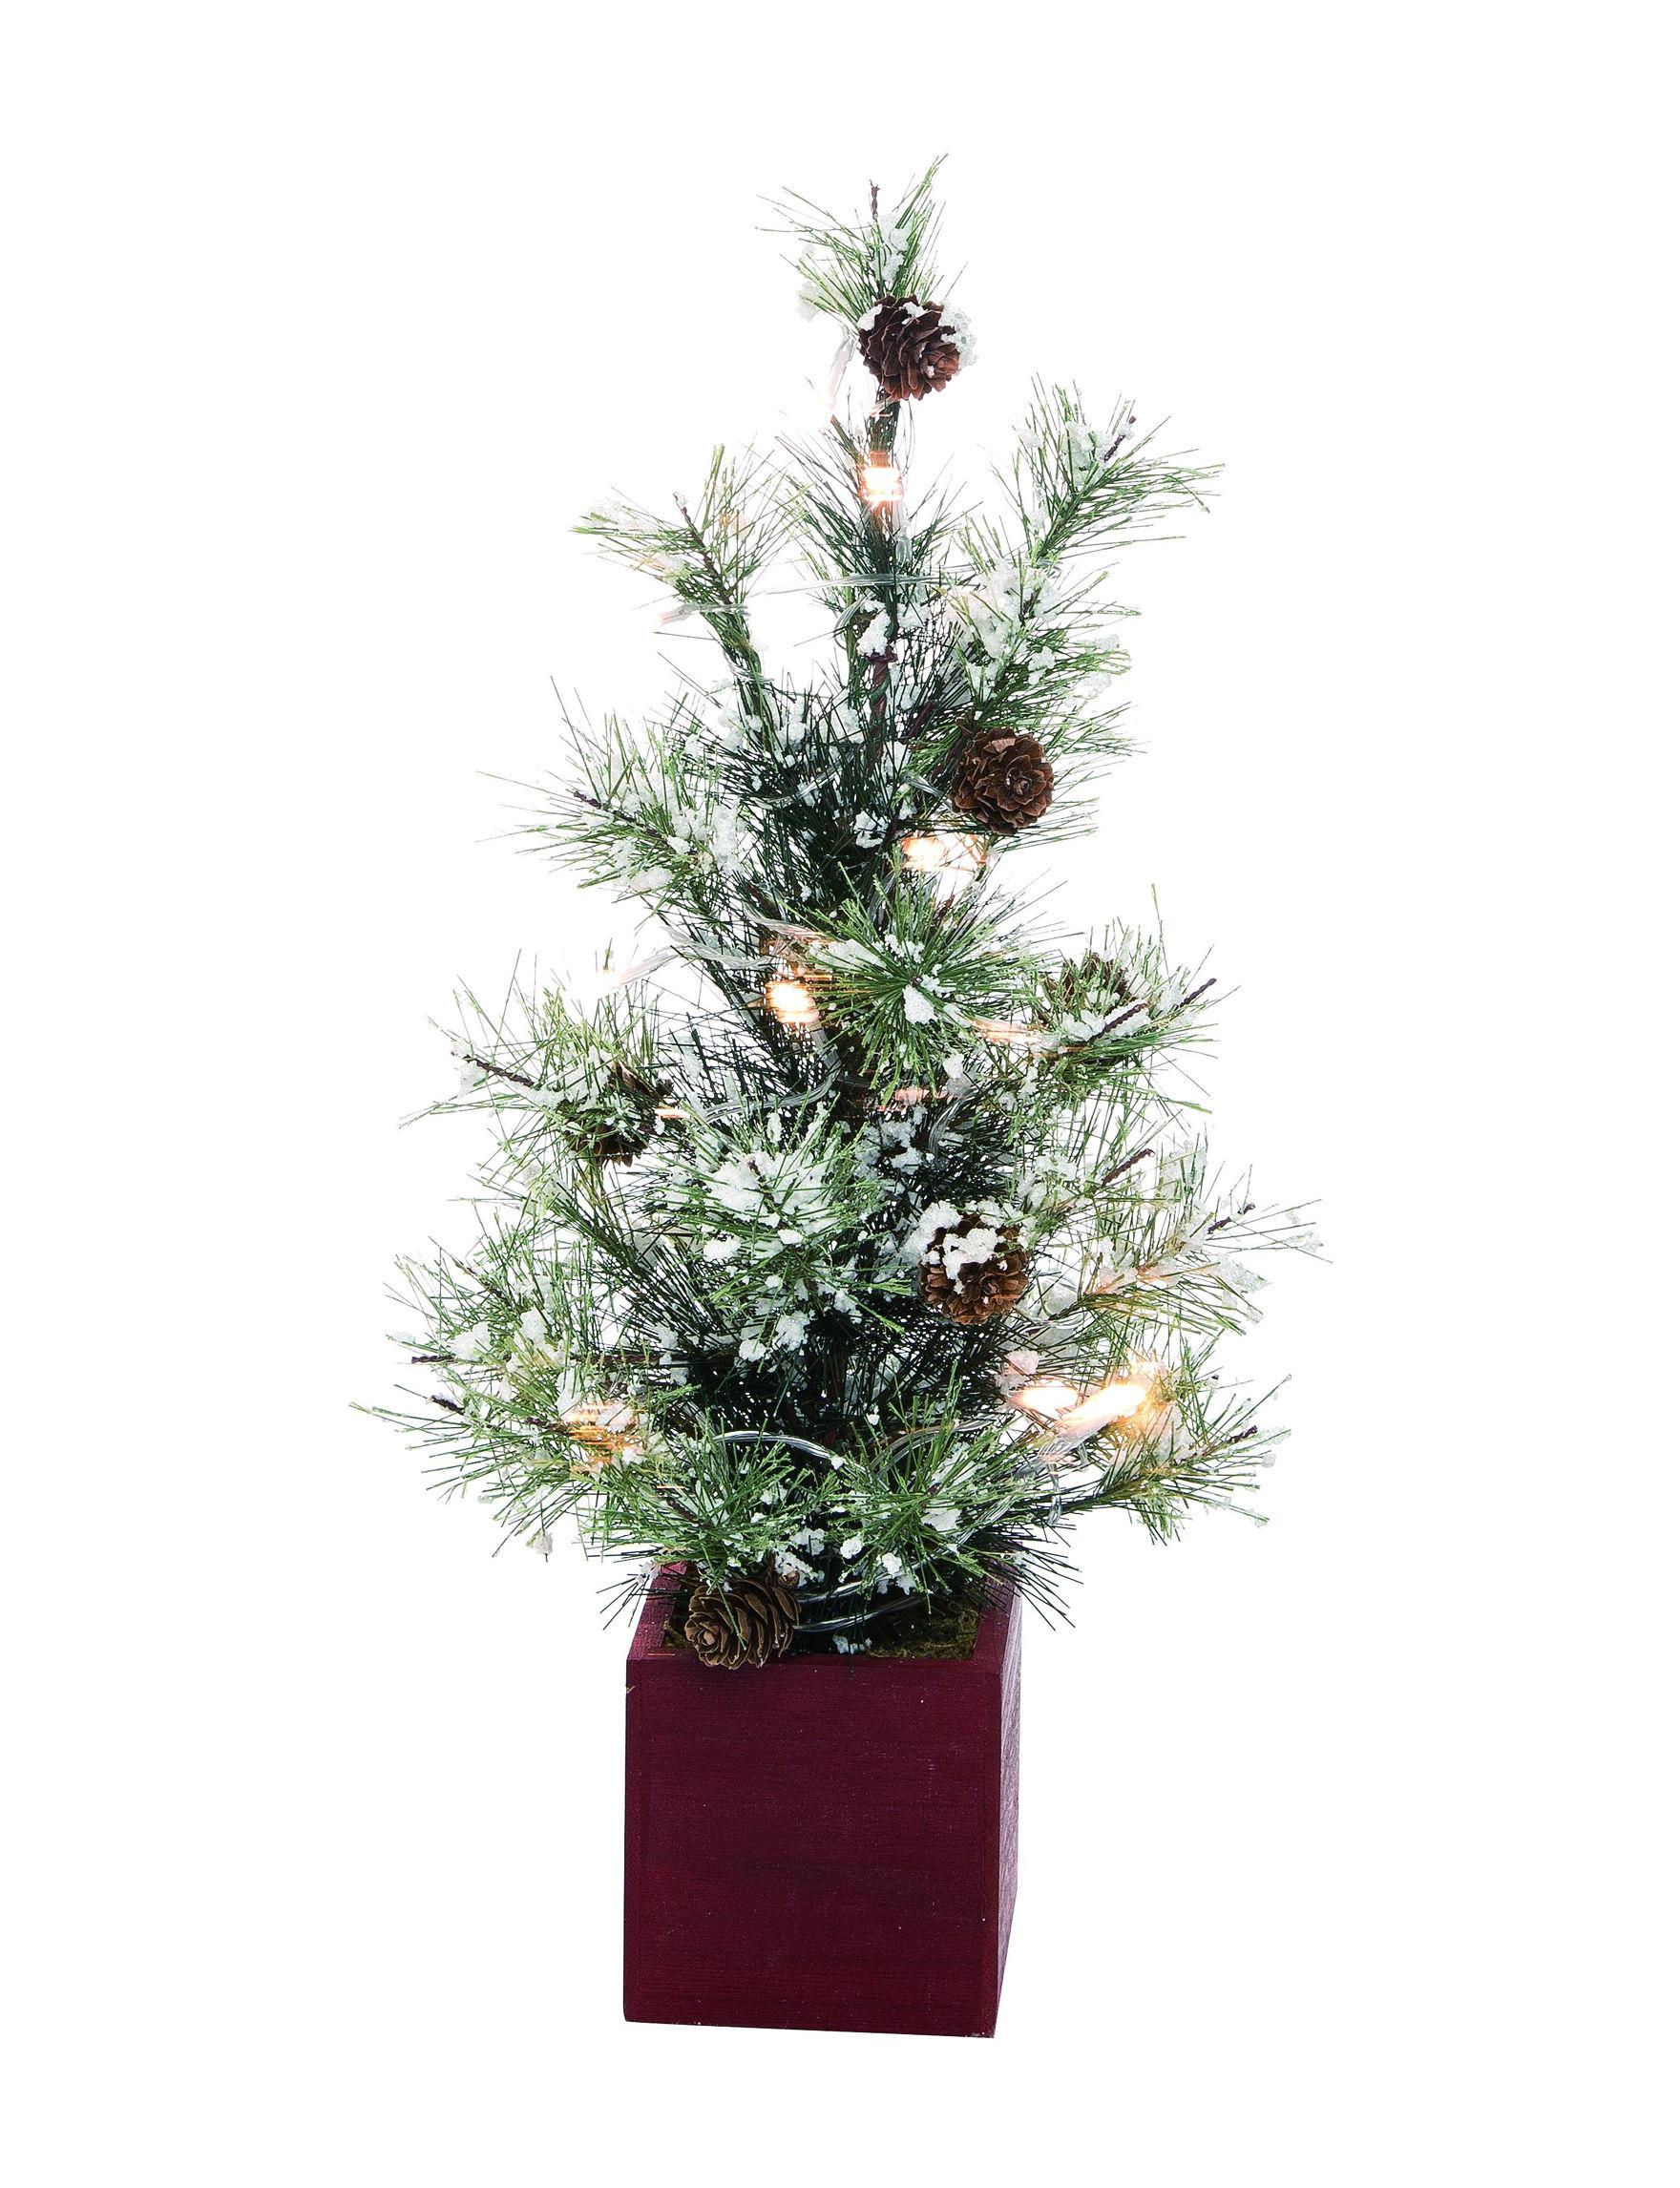 Transpac Green Faux Plants Holiday Decor